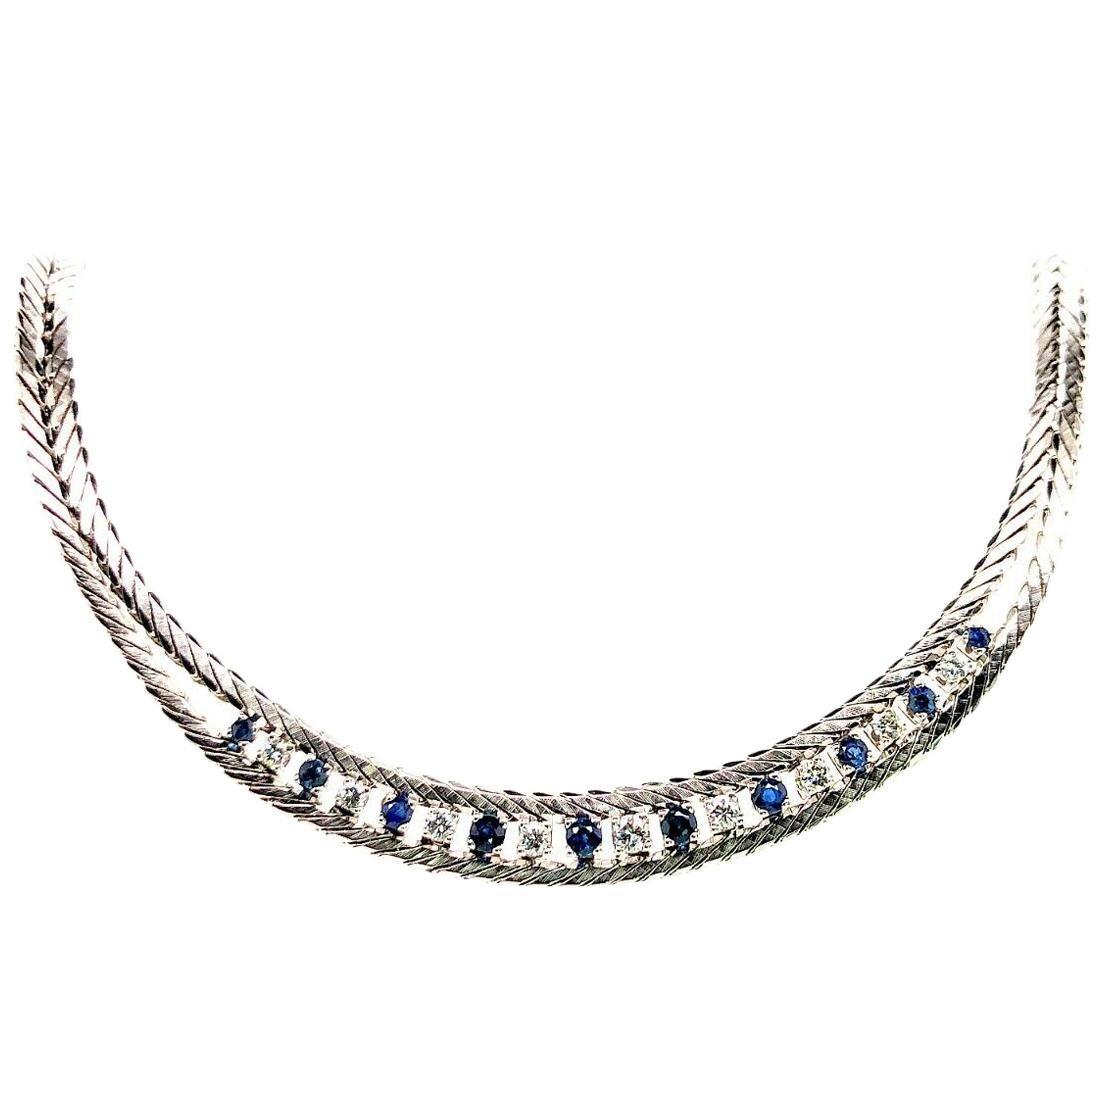 H.STERN Company 18 Karat White Gold Sapphire and Diamond Necklace